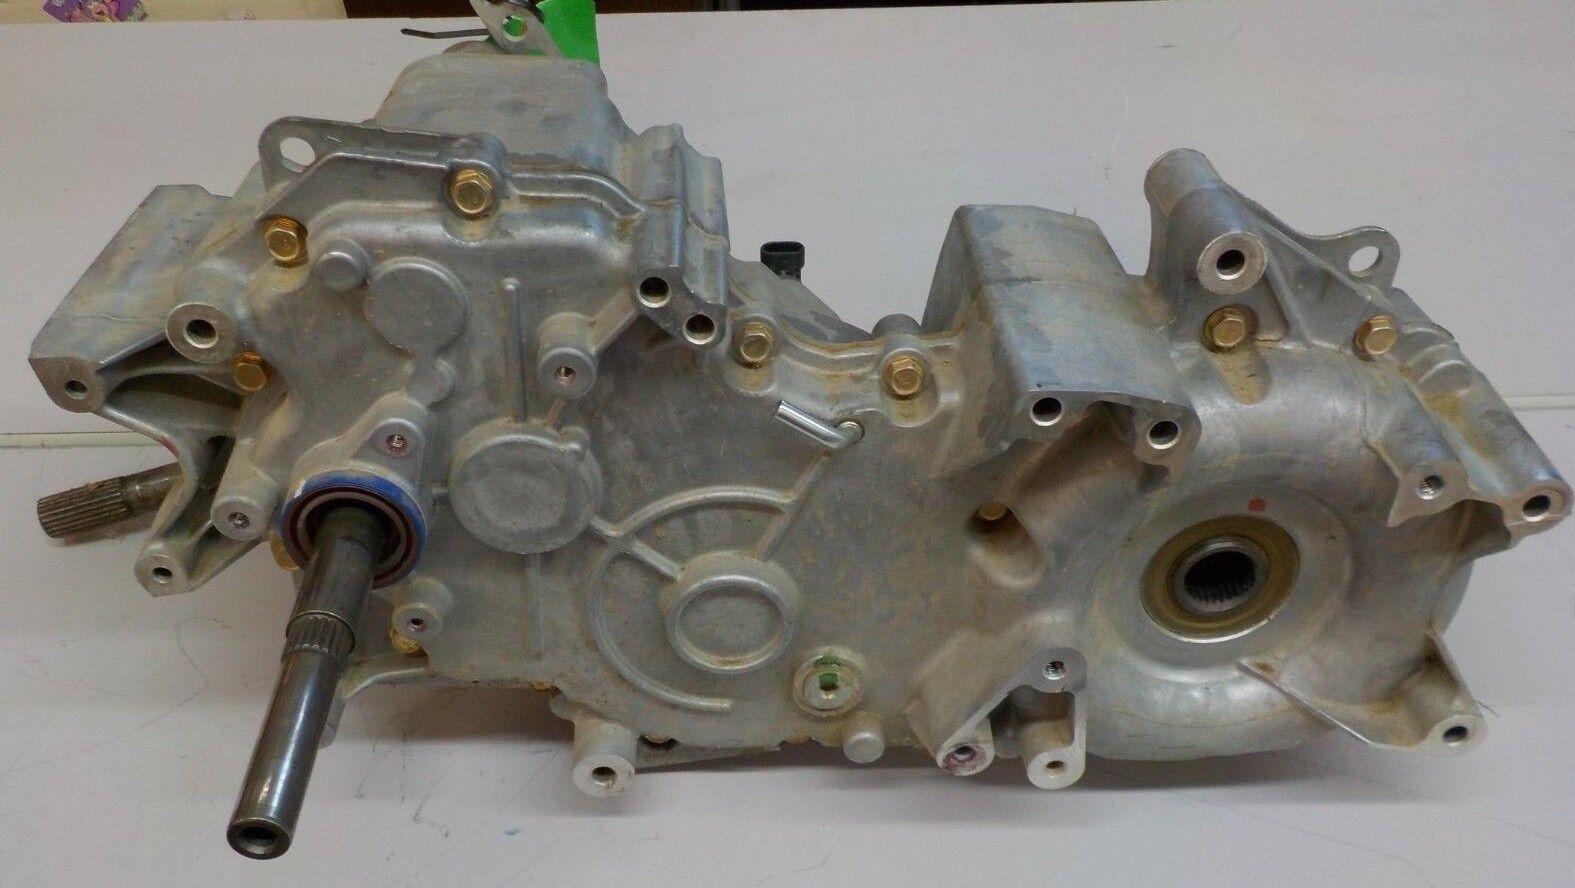 Polaris Rear Gas Shock Sportsman 850 2009-2013 ATV Part# 183-04416